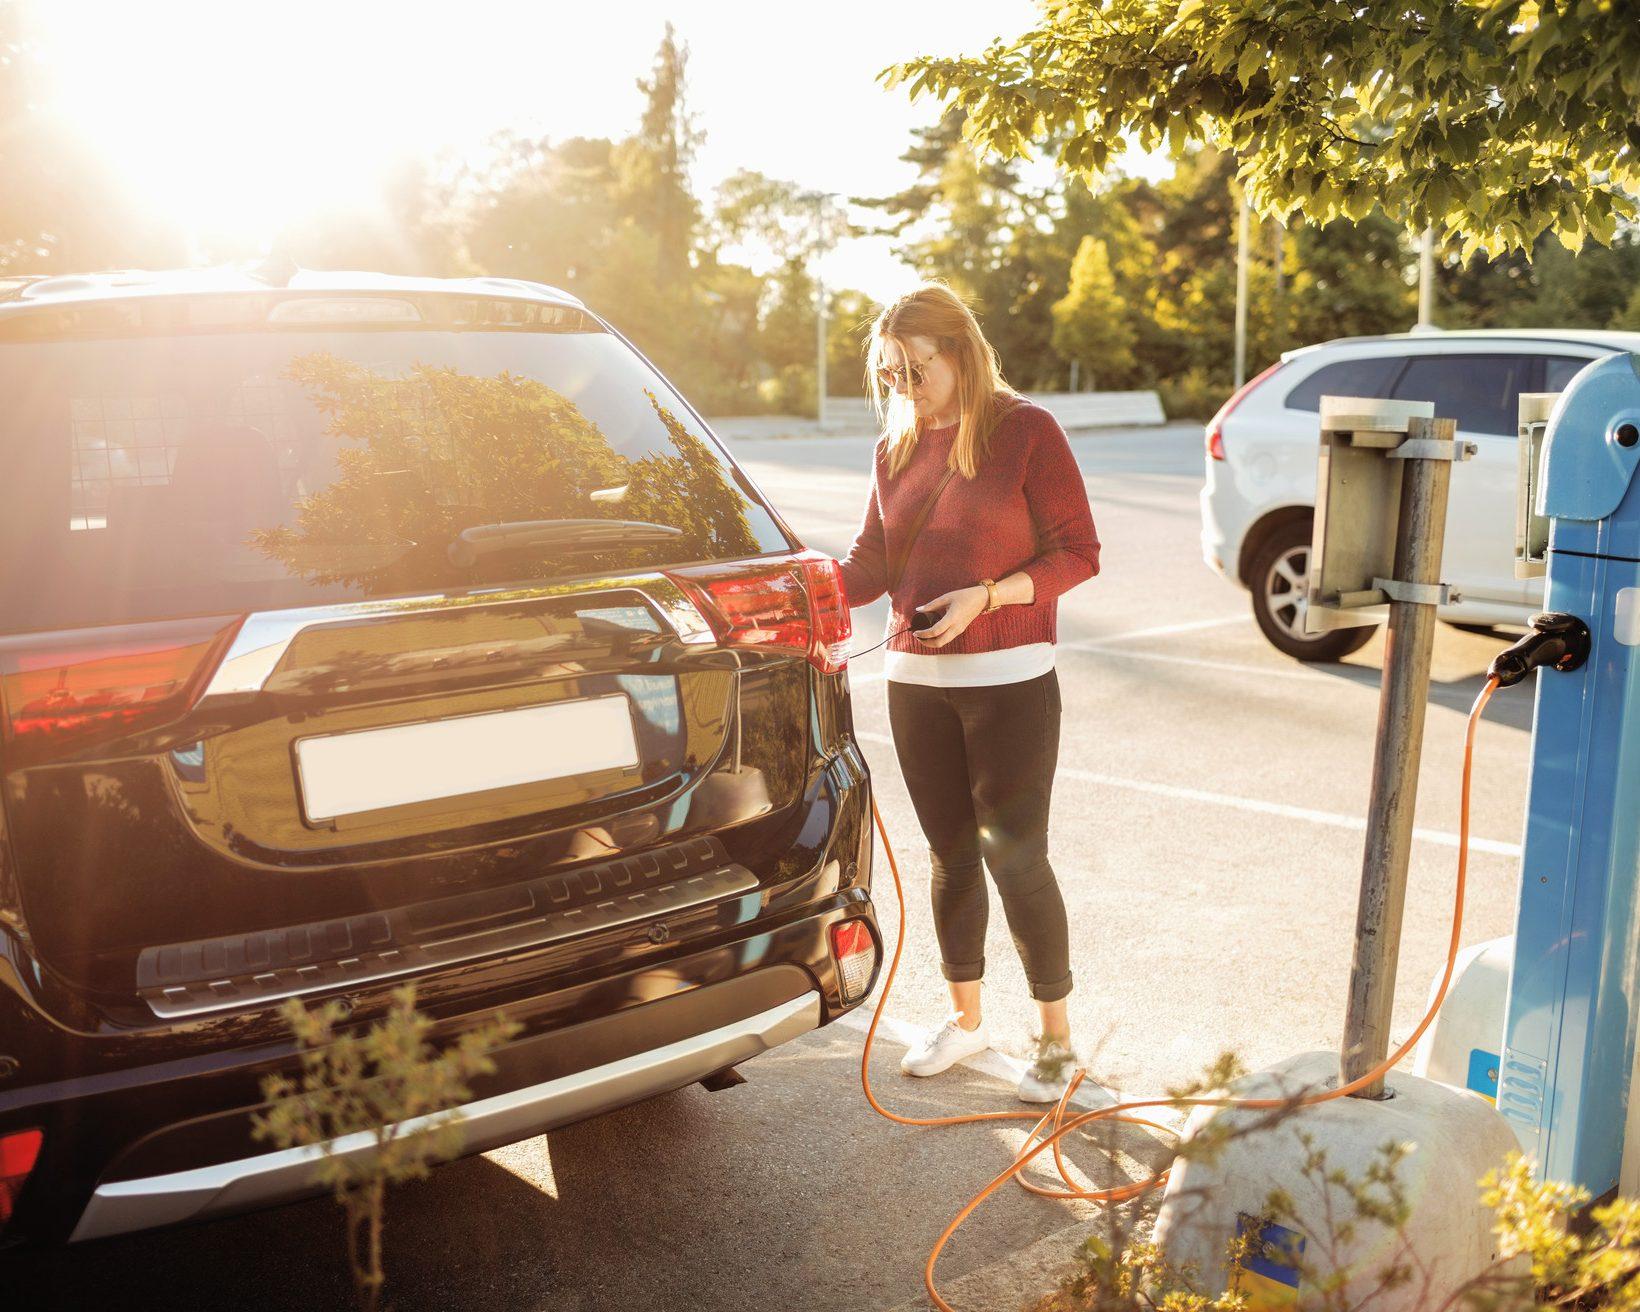 Choosing between electric and hybrid cars